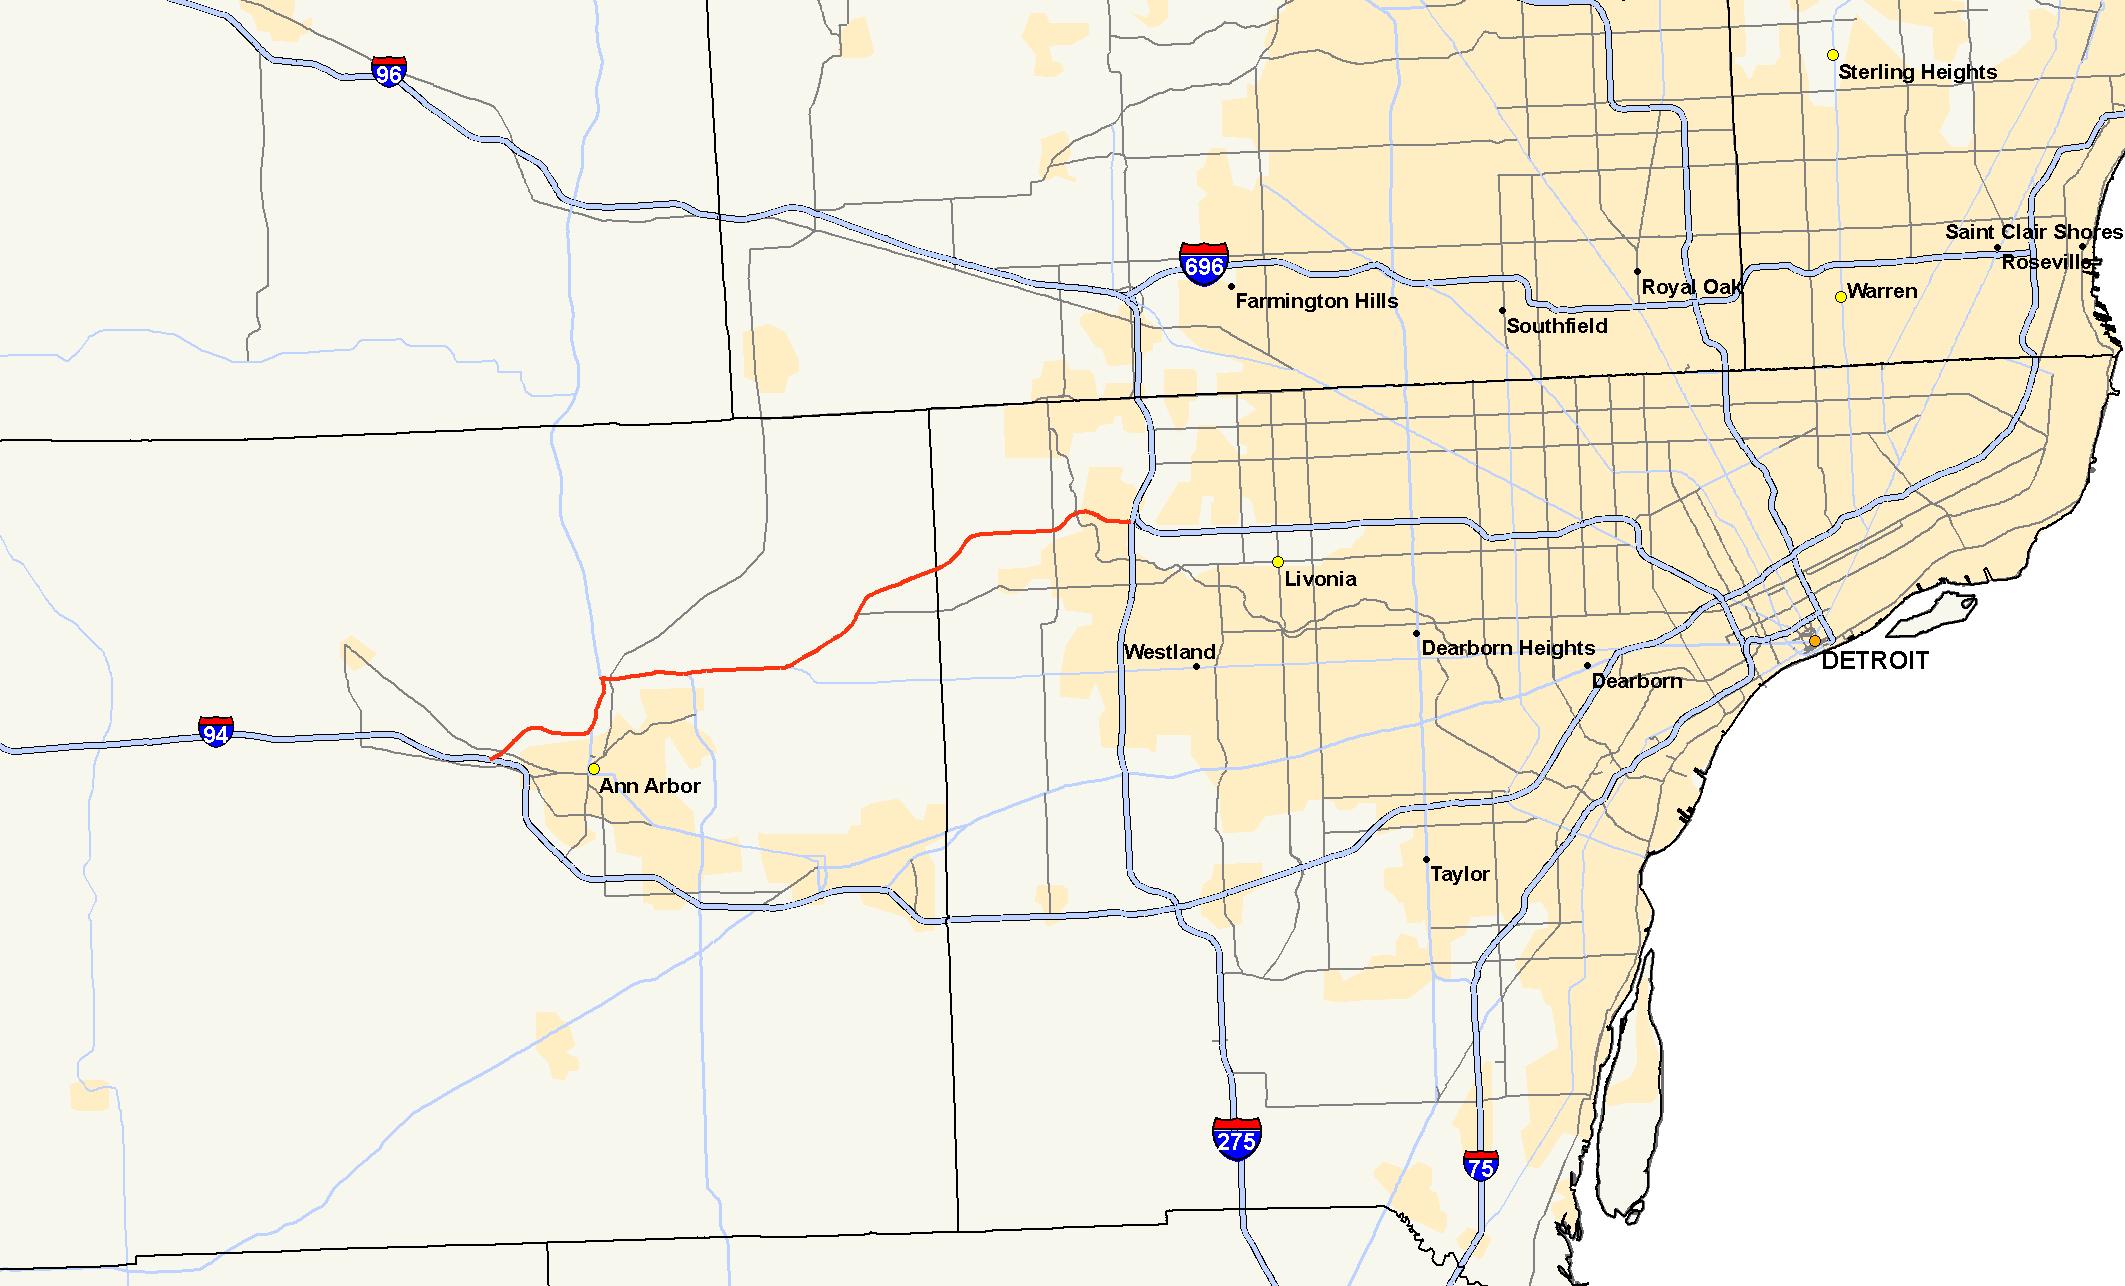 Metro Detroit Traffic Map.M 14 Michigan Highway Wikipedia